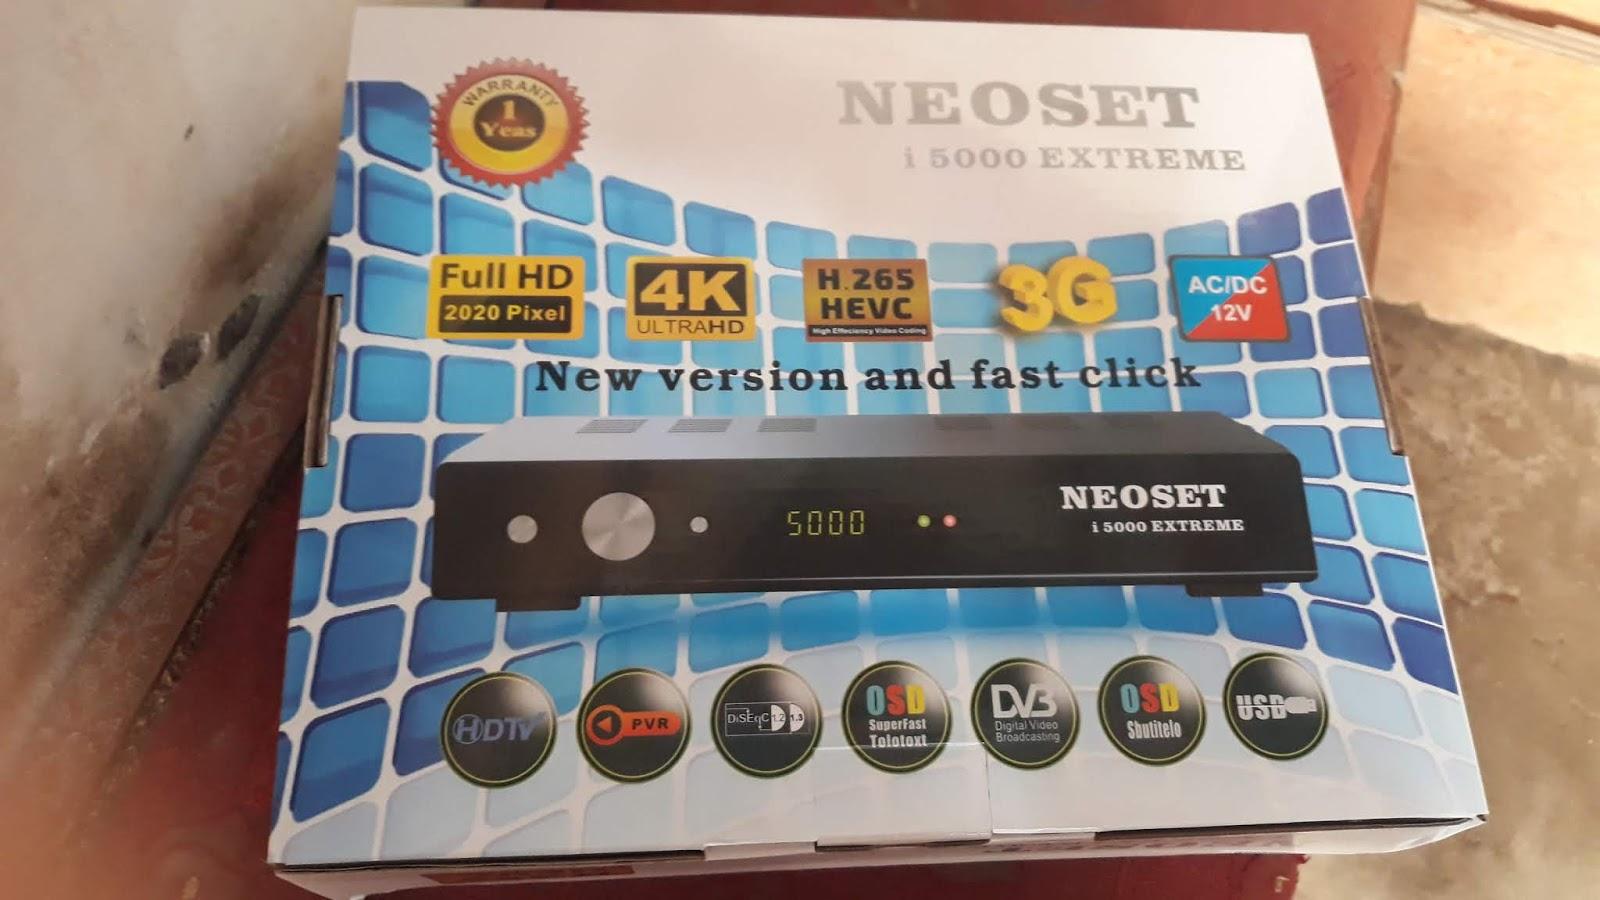 Neosat I5000 Extreme 4K HEVC H 265 with Server 12 Month Urdu